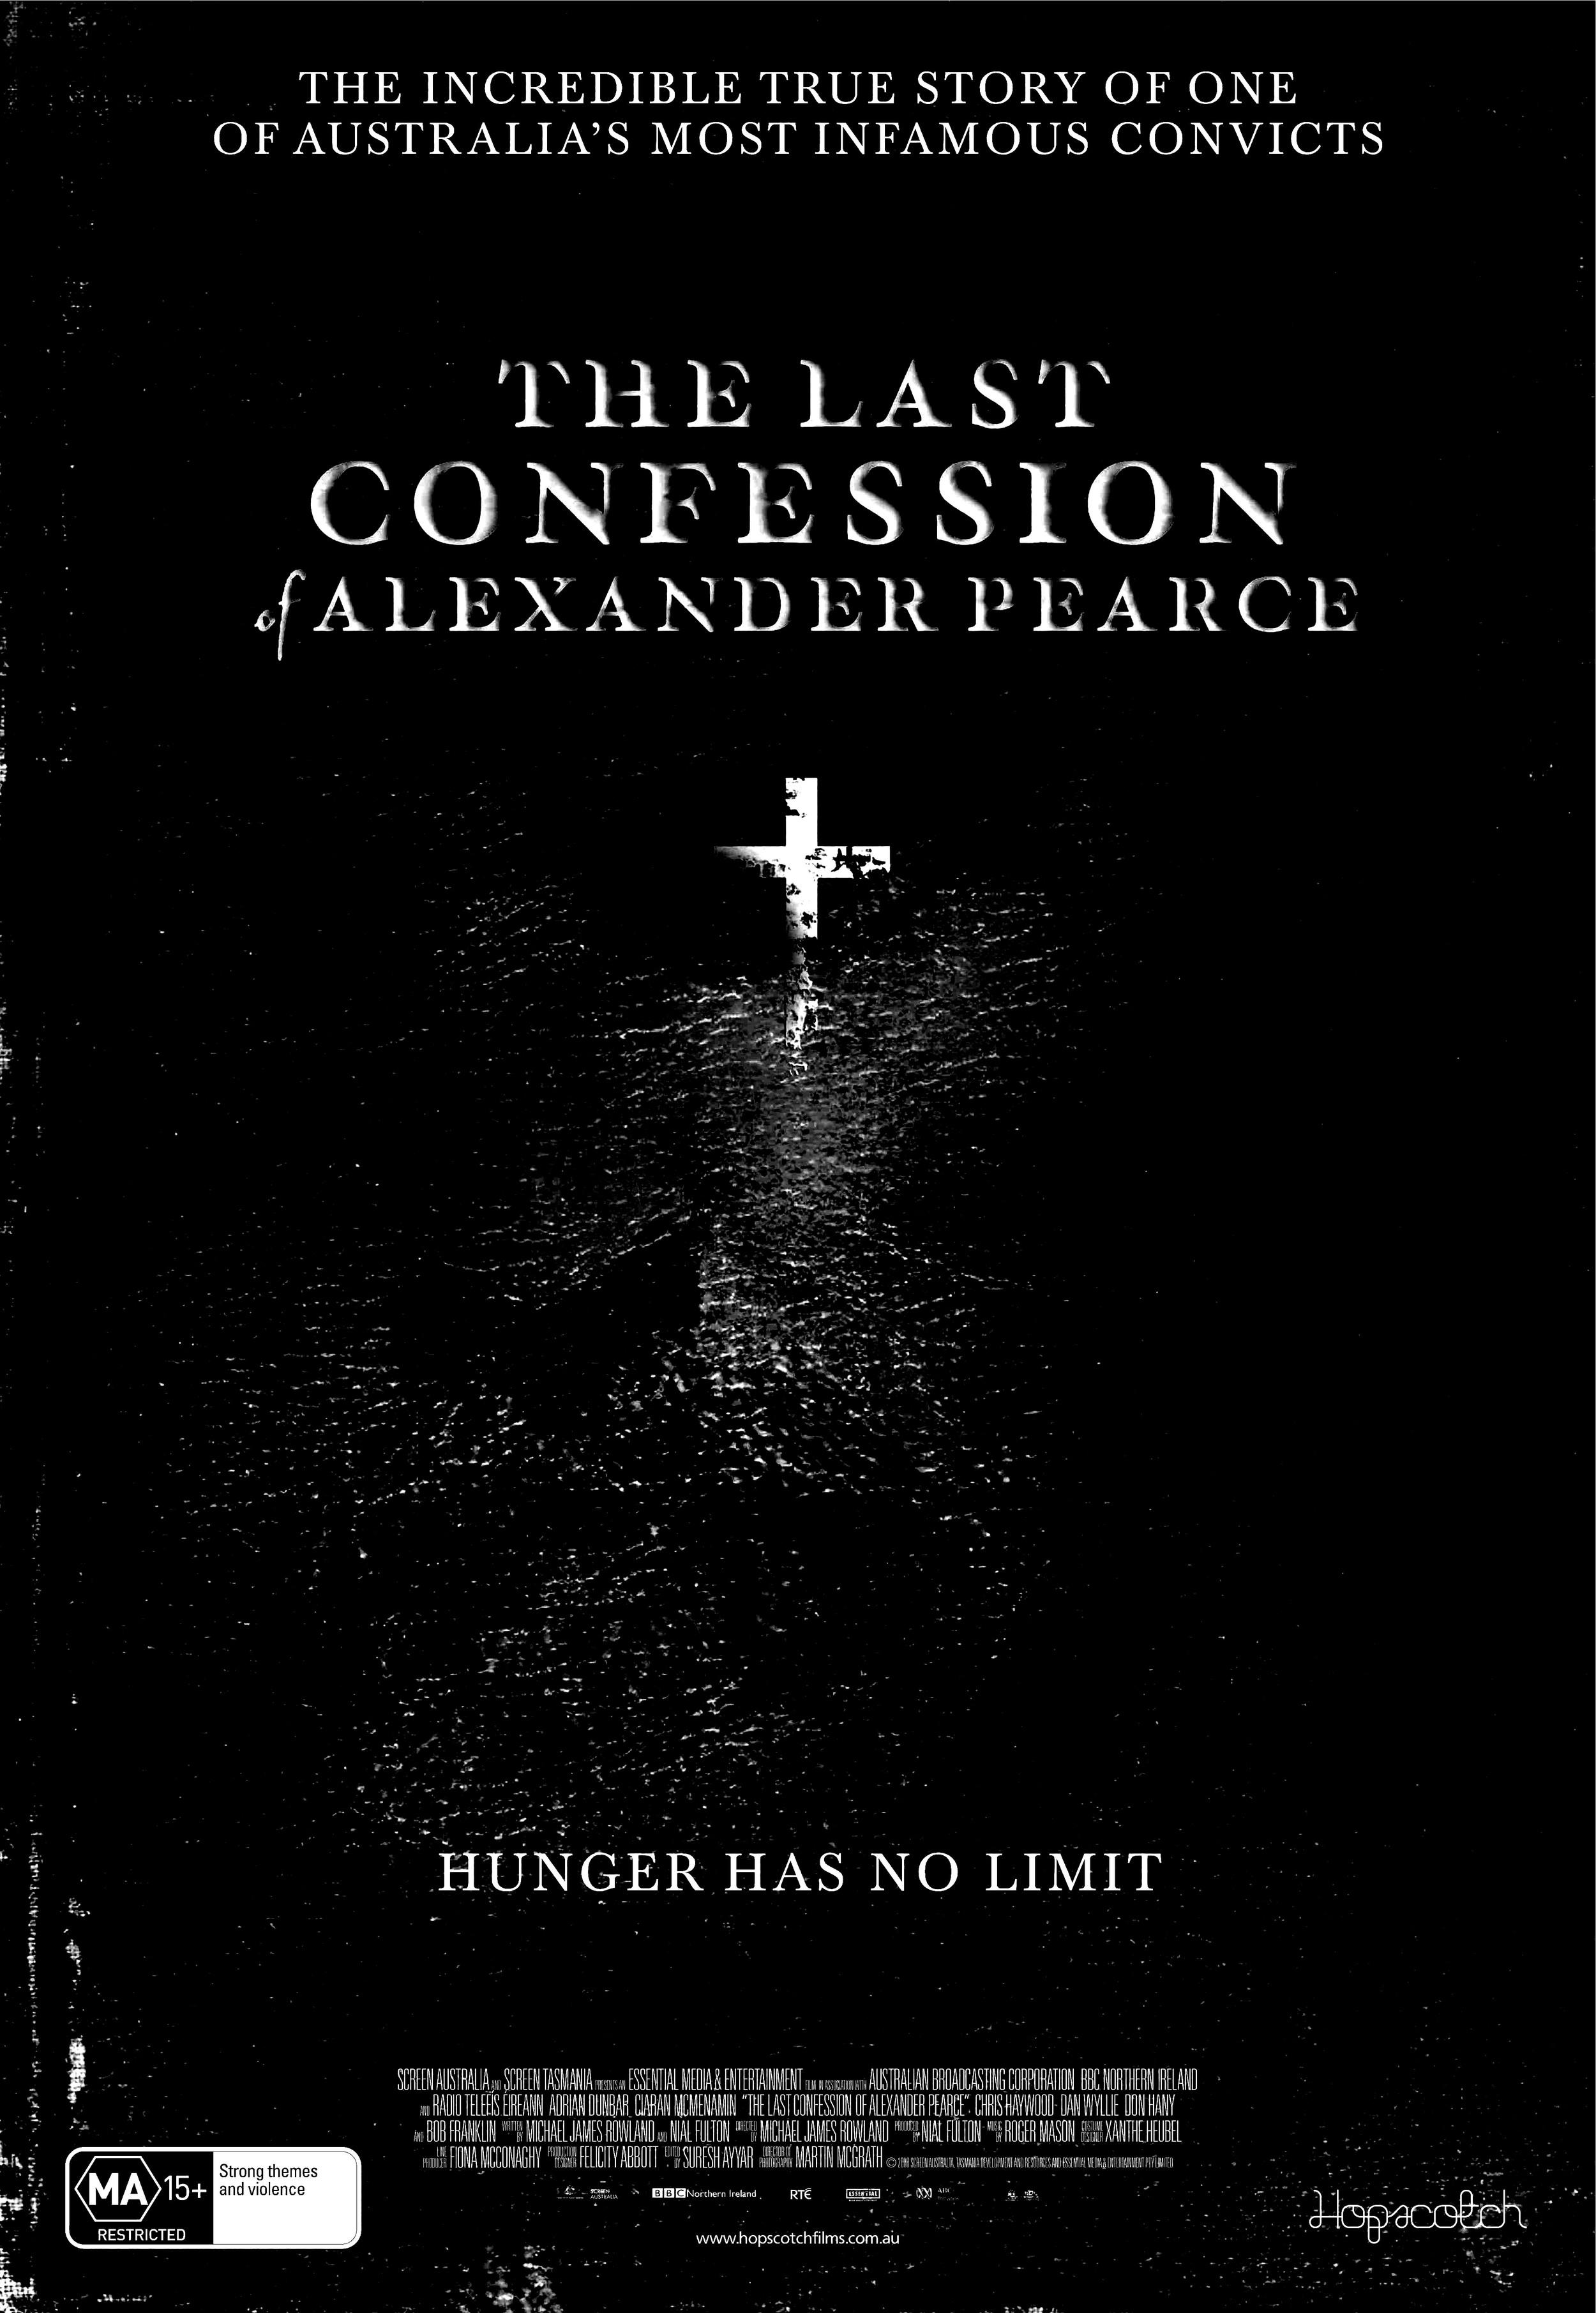 AlexanderPearce.jpeg